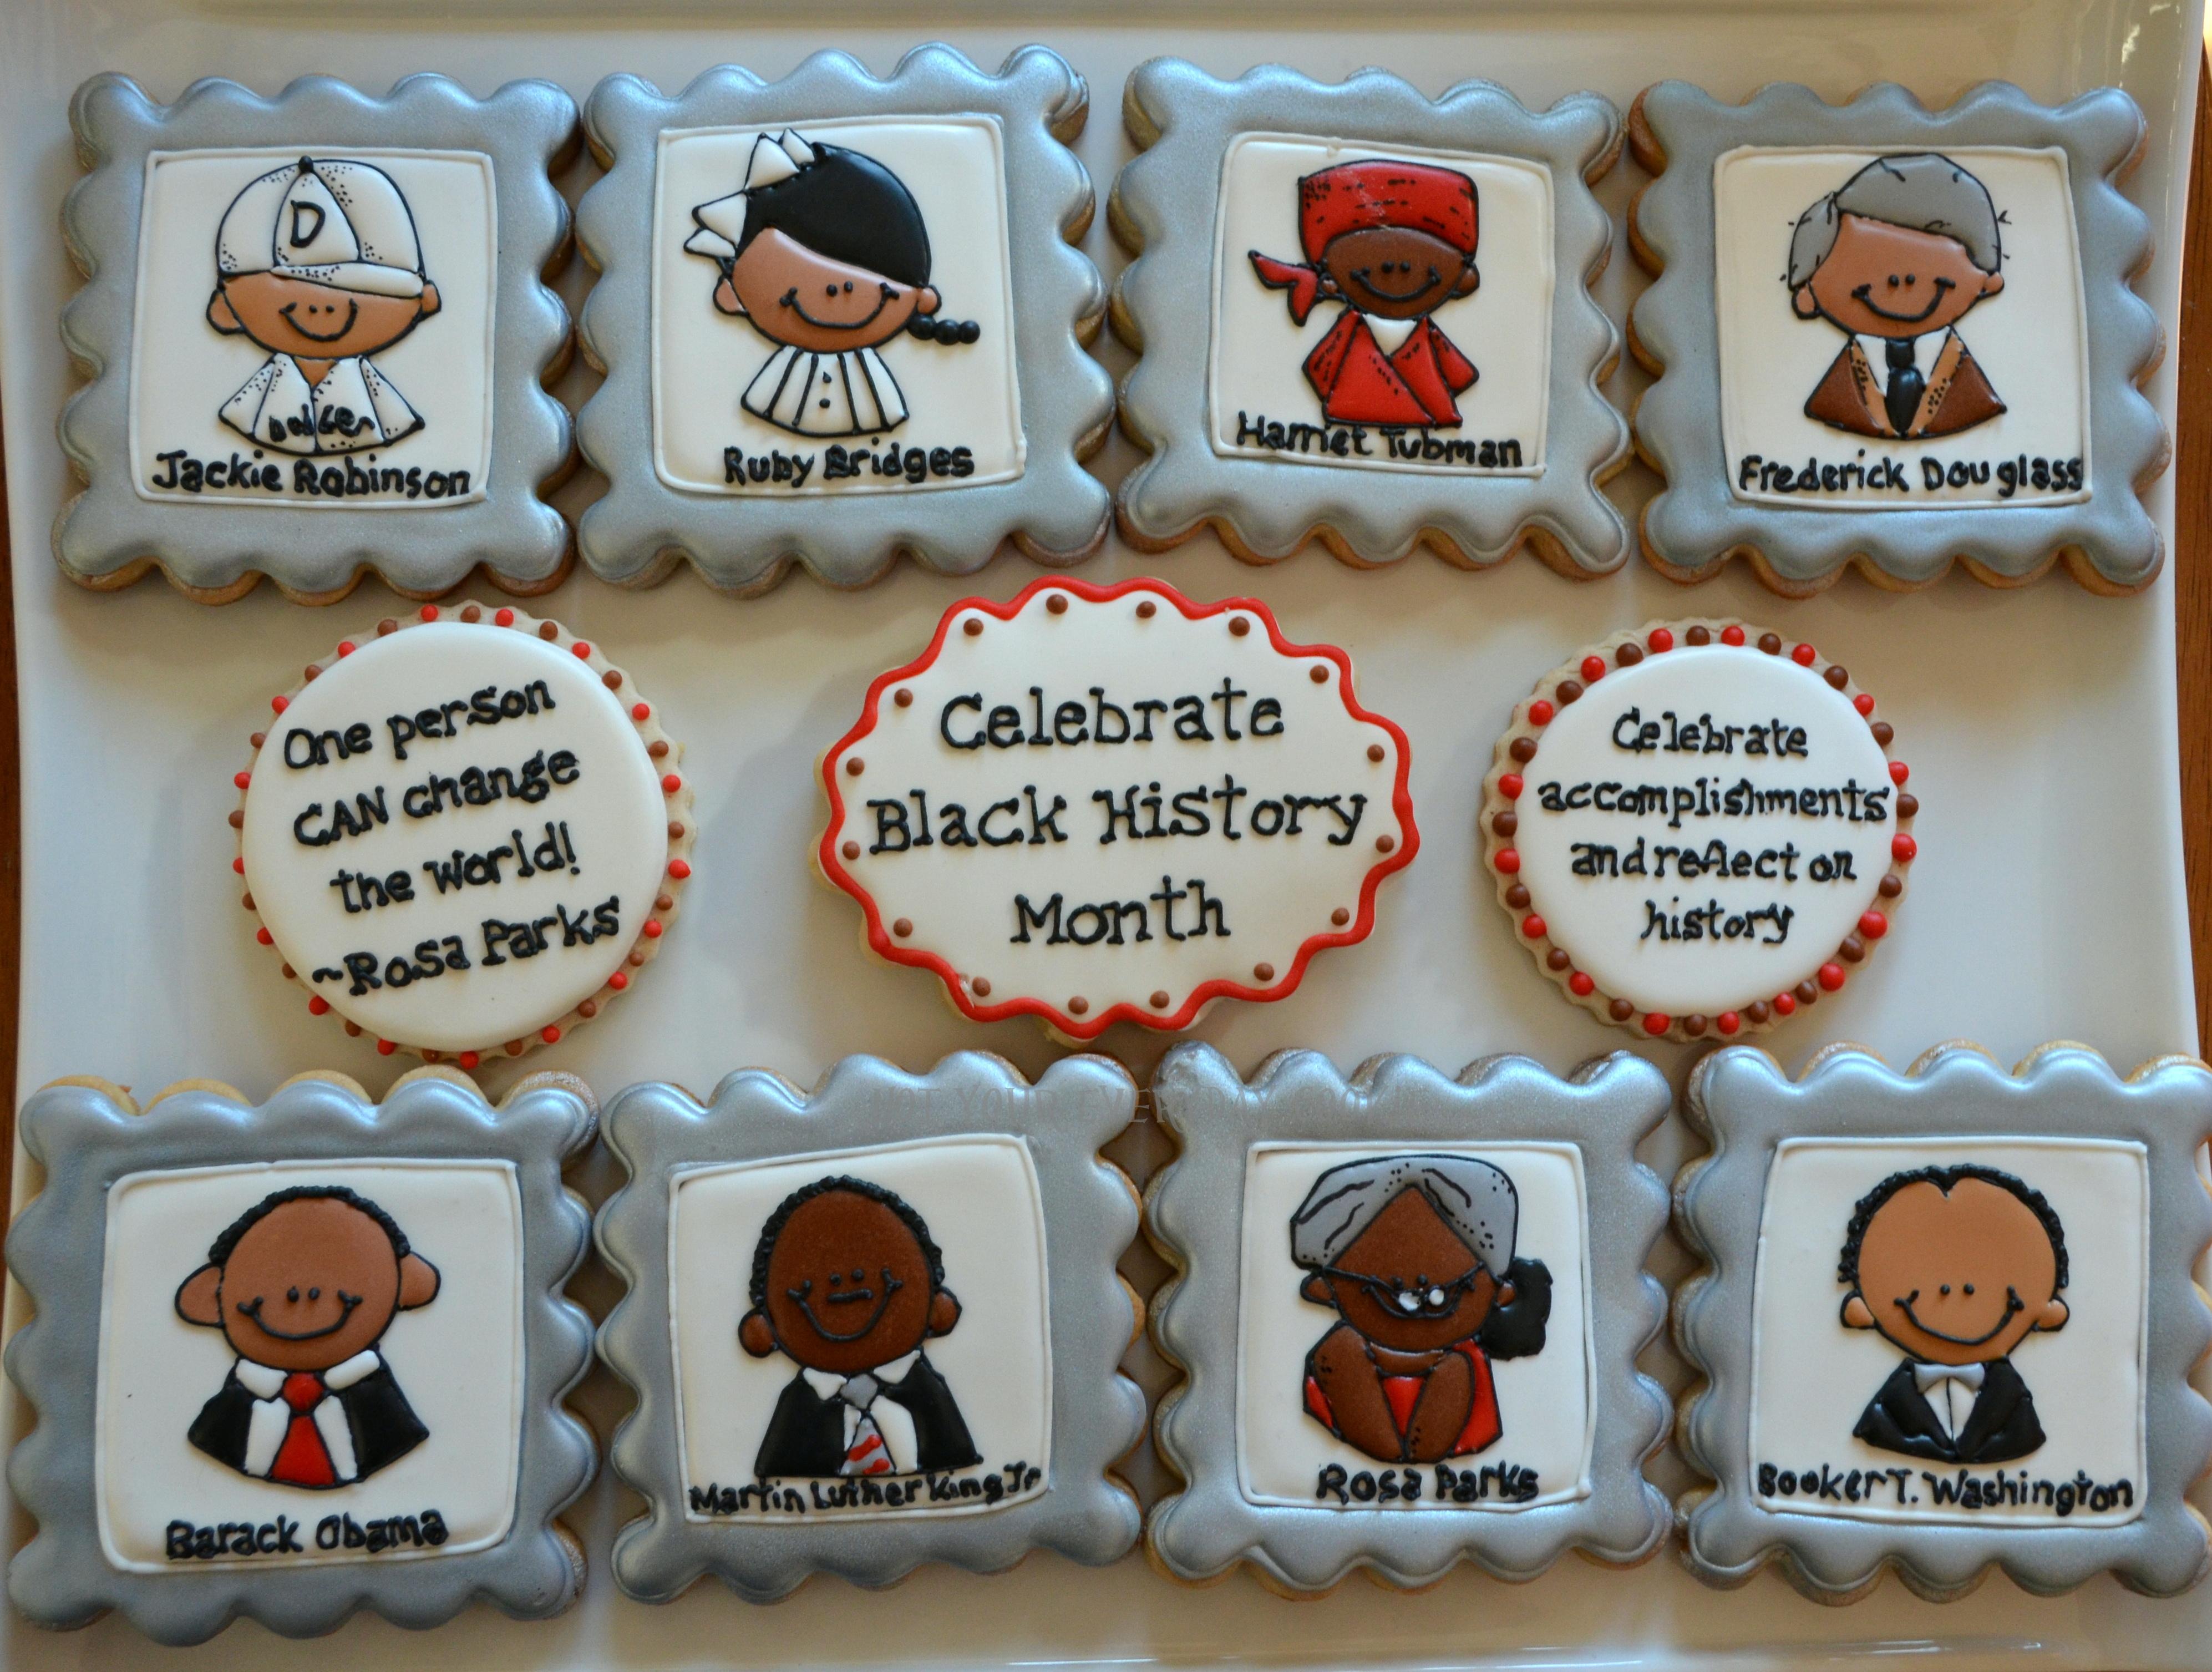 Black History Month Cookies